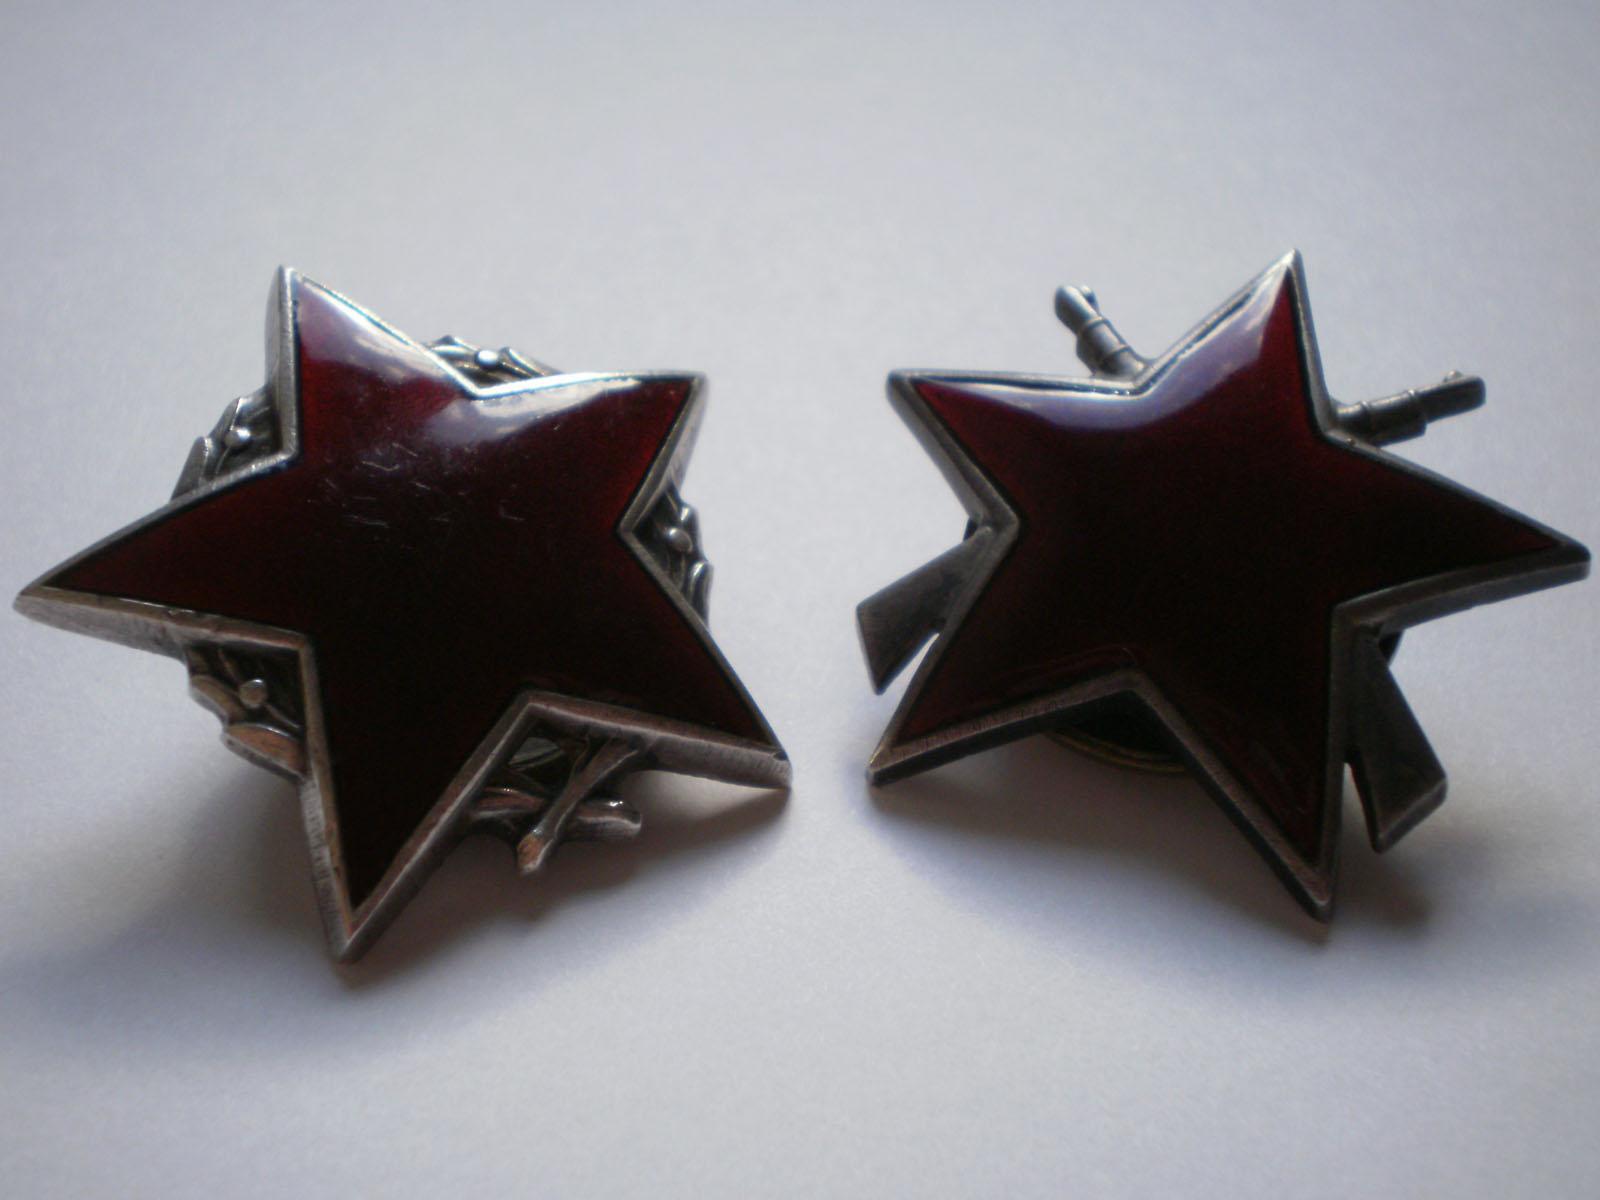 Yugoslav Order of the Partisan Star